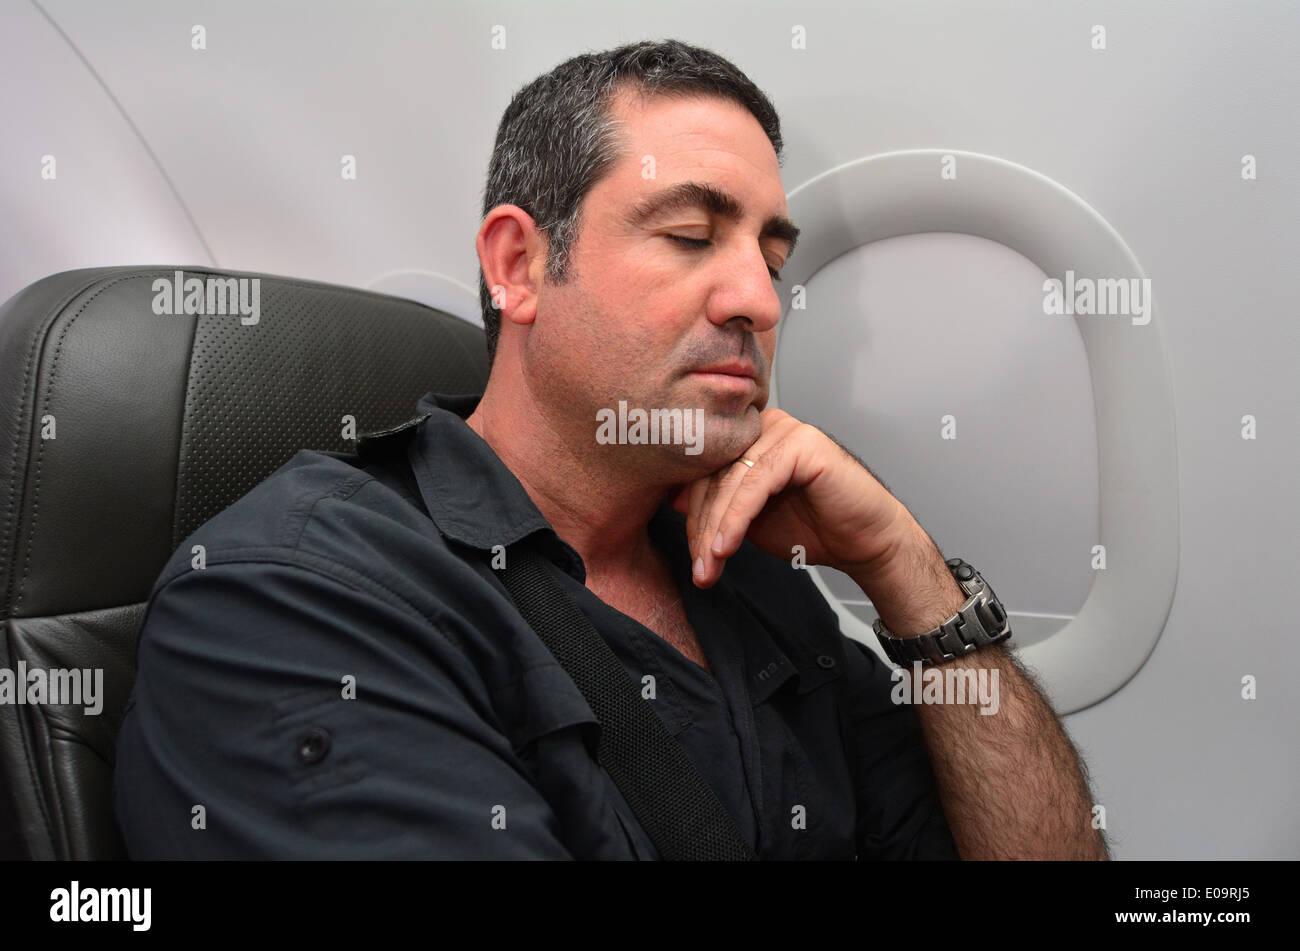 Man sleep during flight aboard a jetliner airplane. - Stock Image